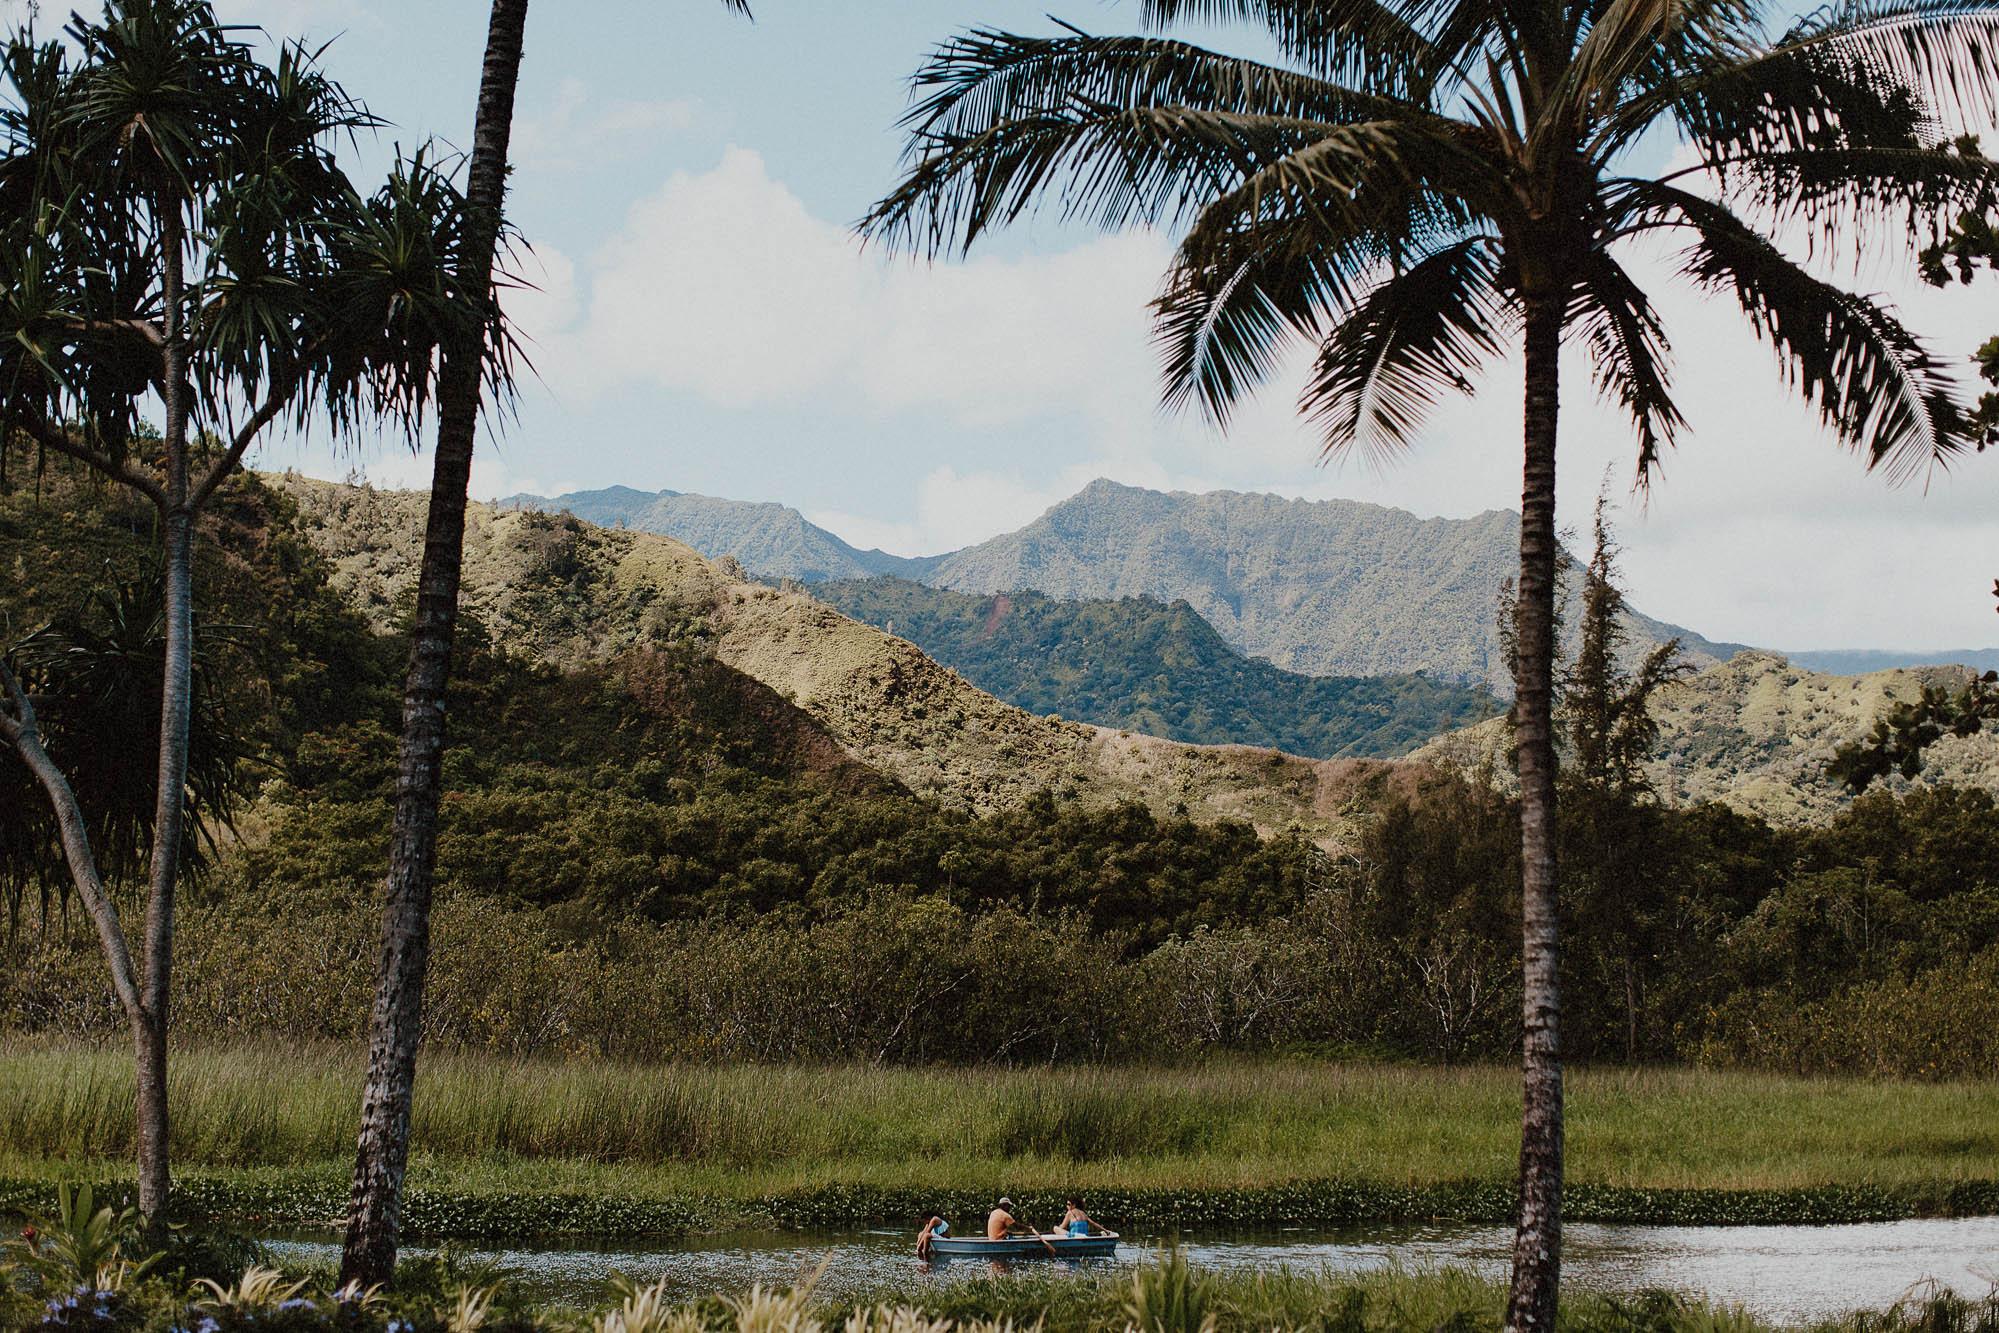 Views of north shore hanalei kauai mountain range